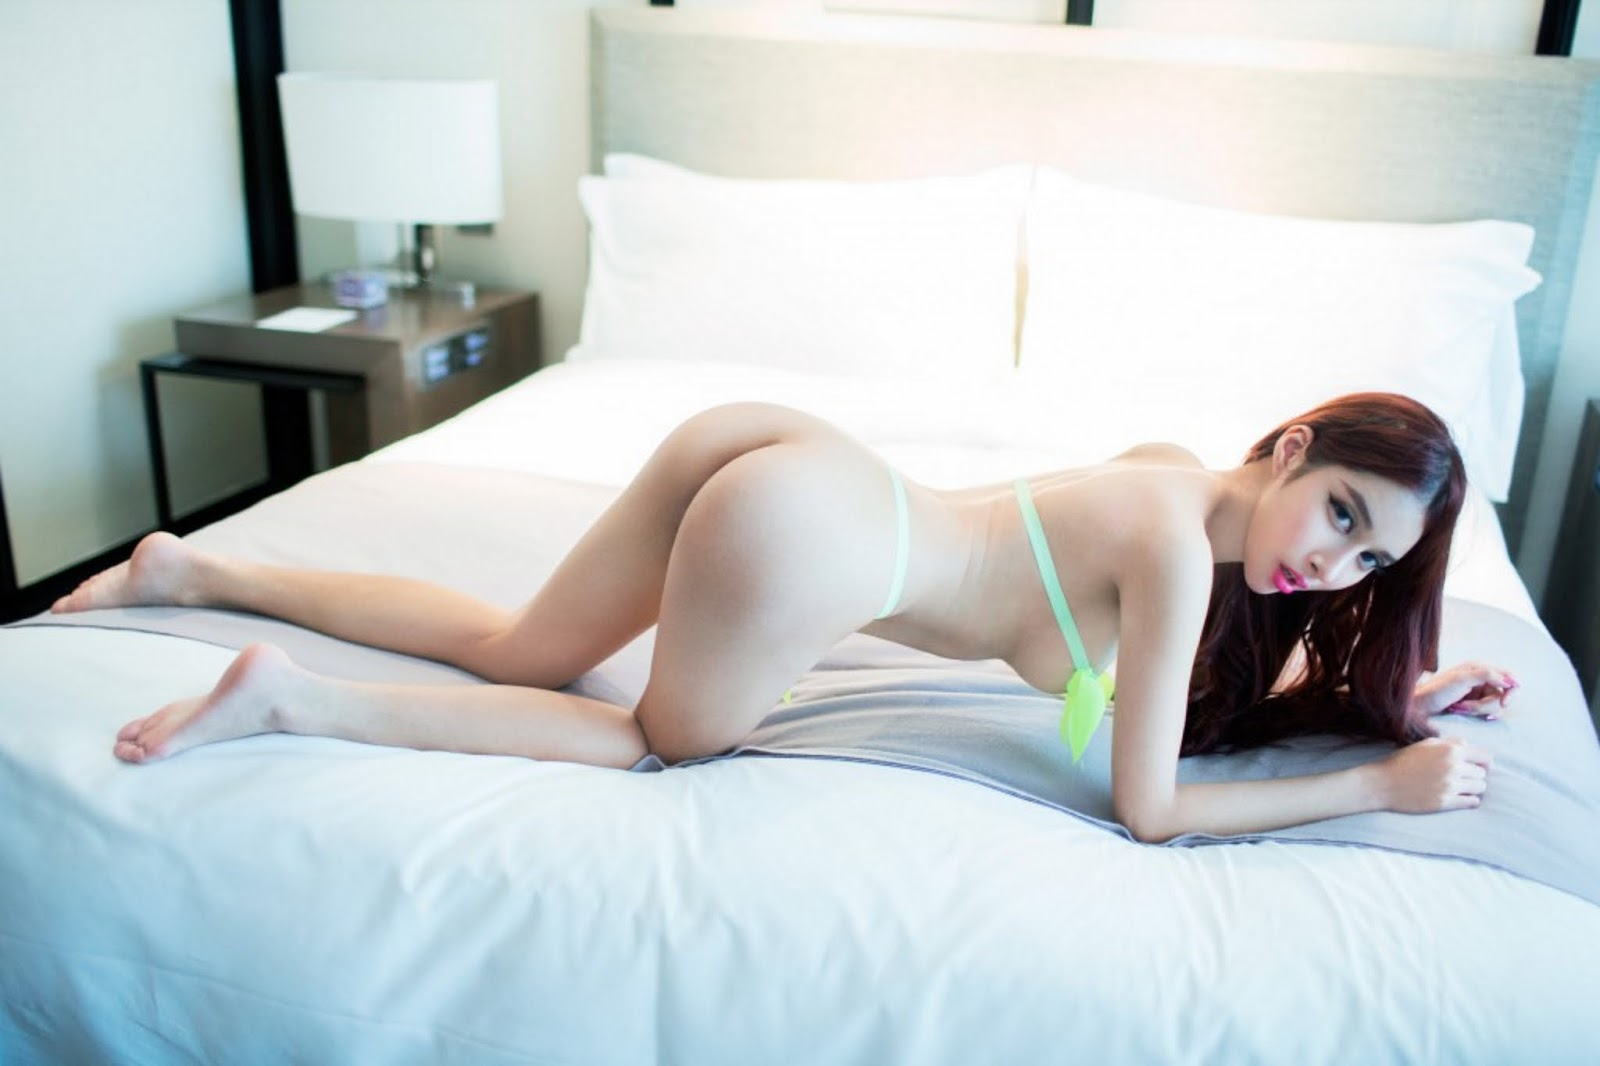 %25C2%25B1 %25C2%25B1 30 - Model Nude TUIGIRL NO.49 Beauty Body Tits